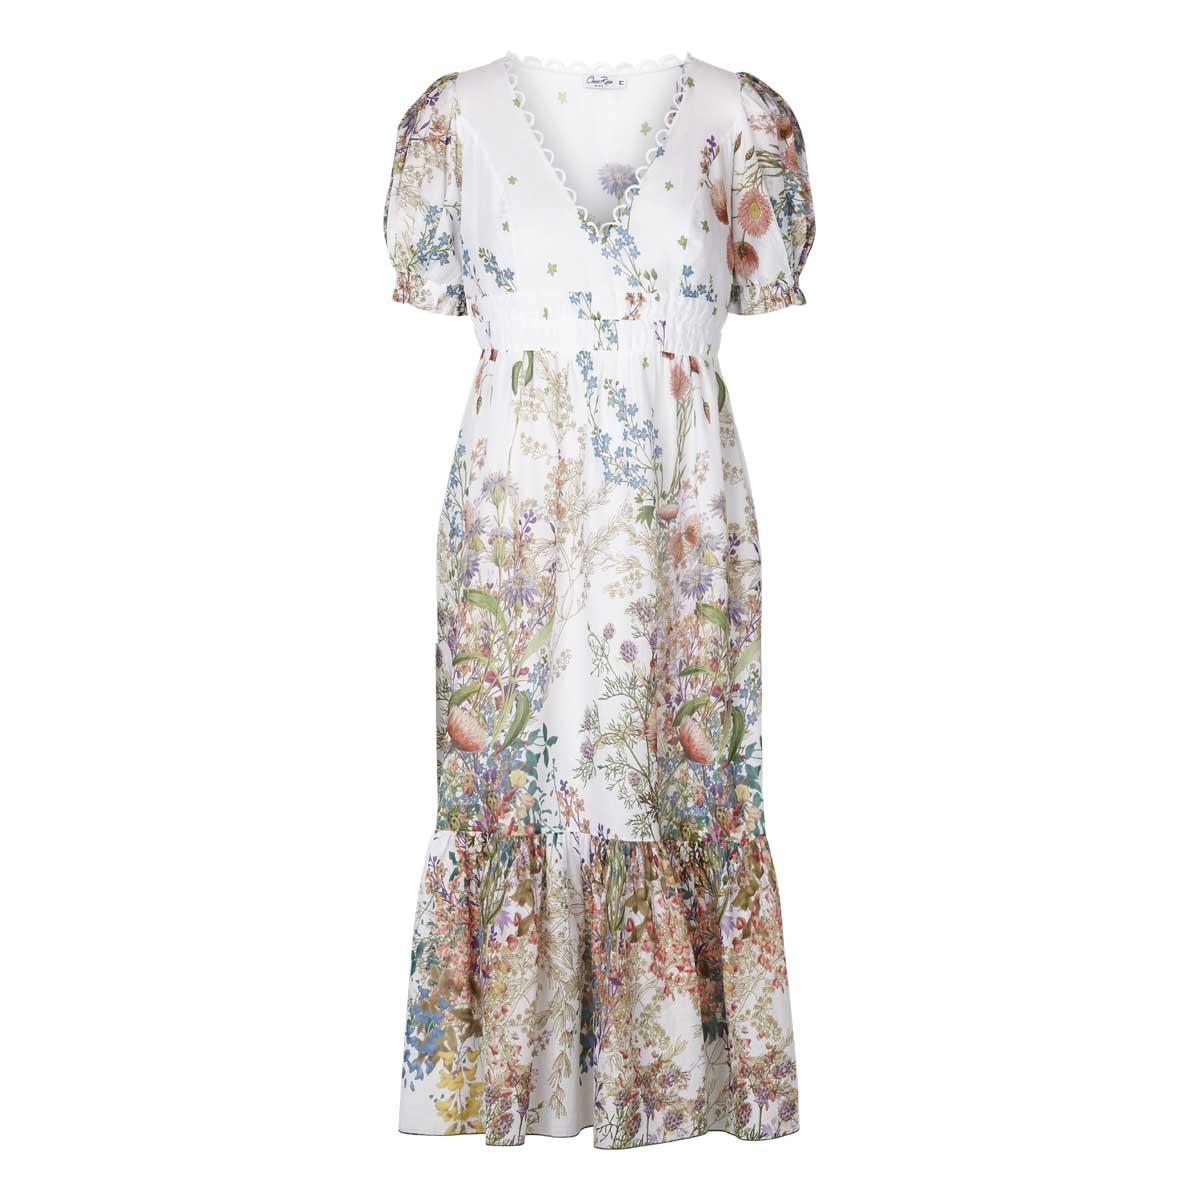 Charo Ruiz, Liberty Long Dress Hvid m.blomster